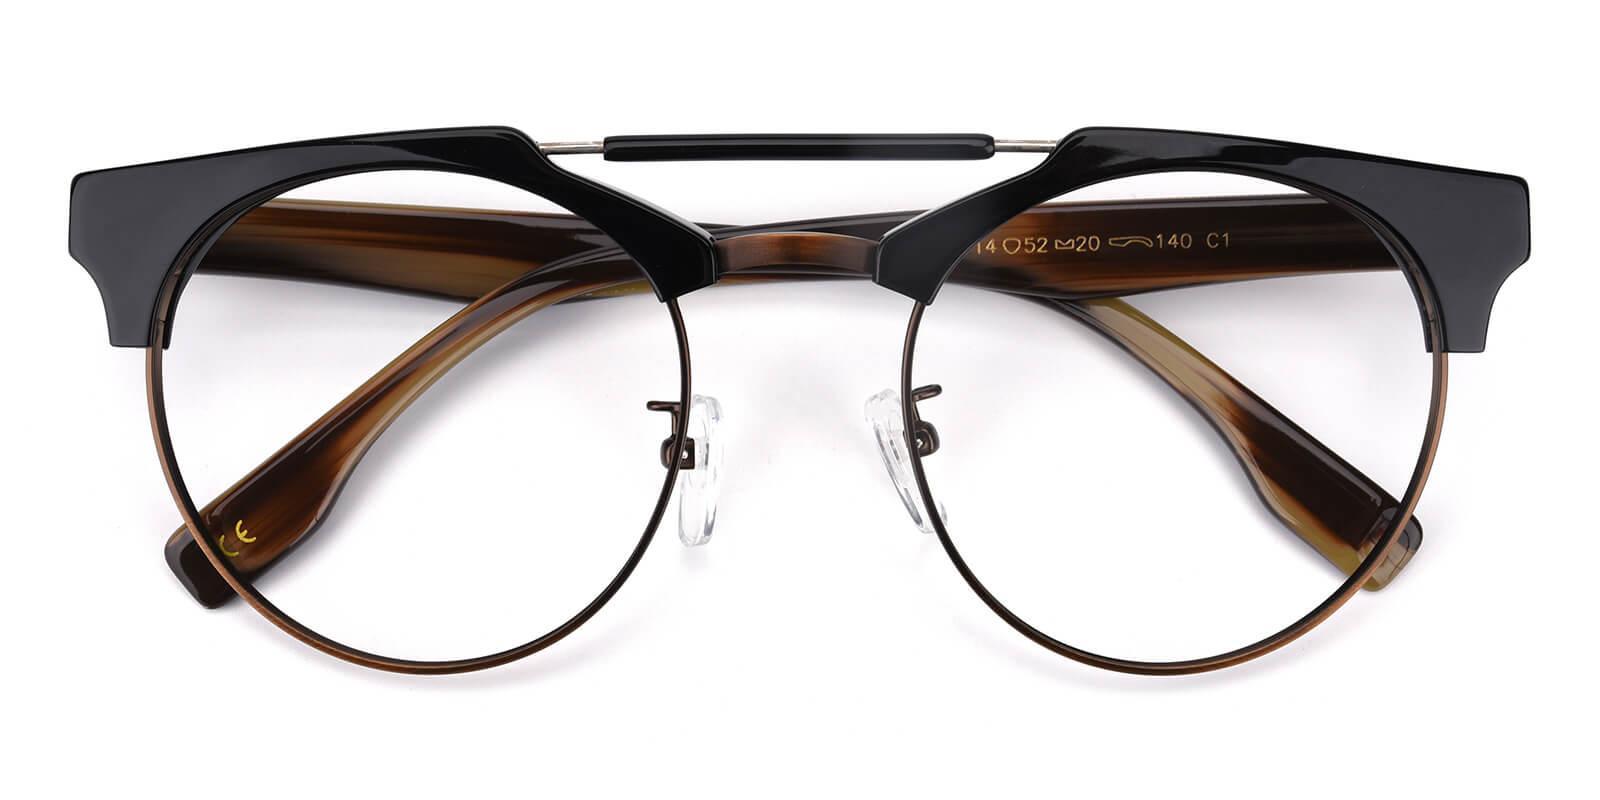 Ombama-Brown-Browline-Combination-Eyeglasses-detail